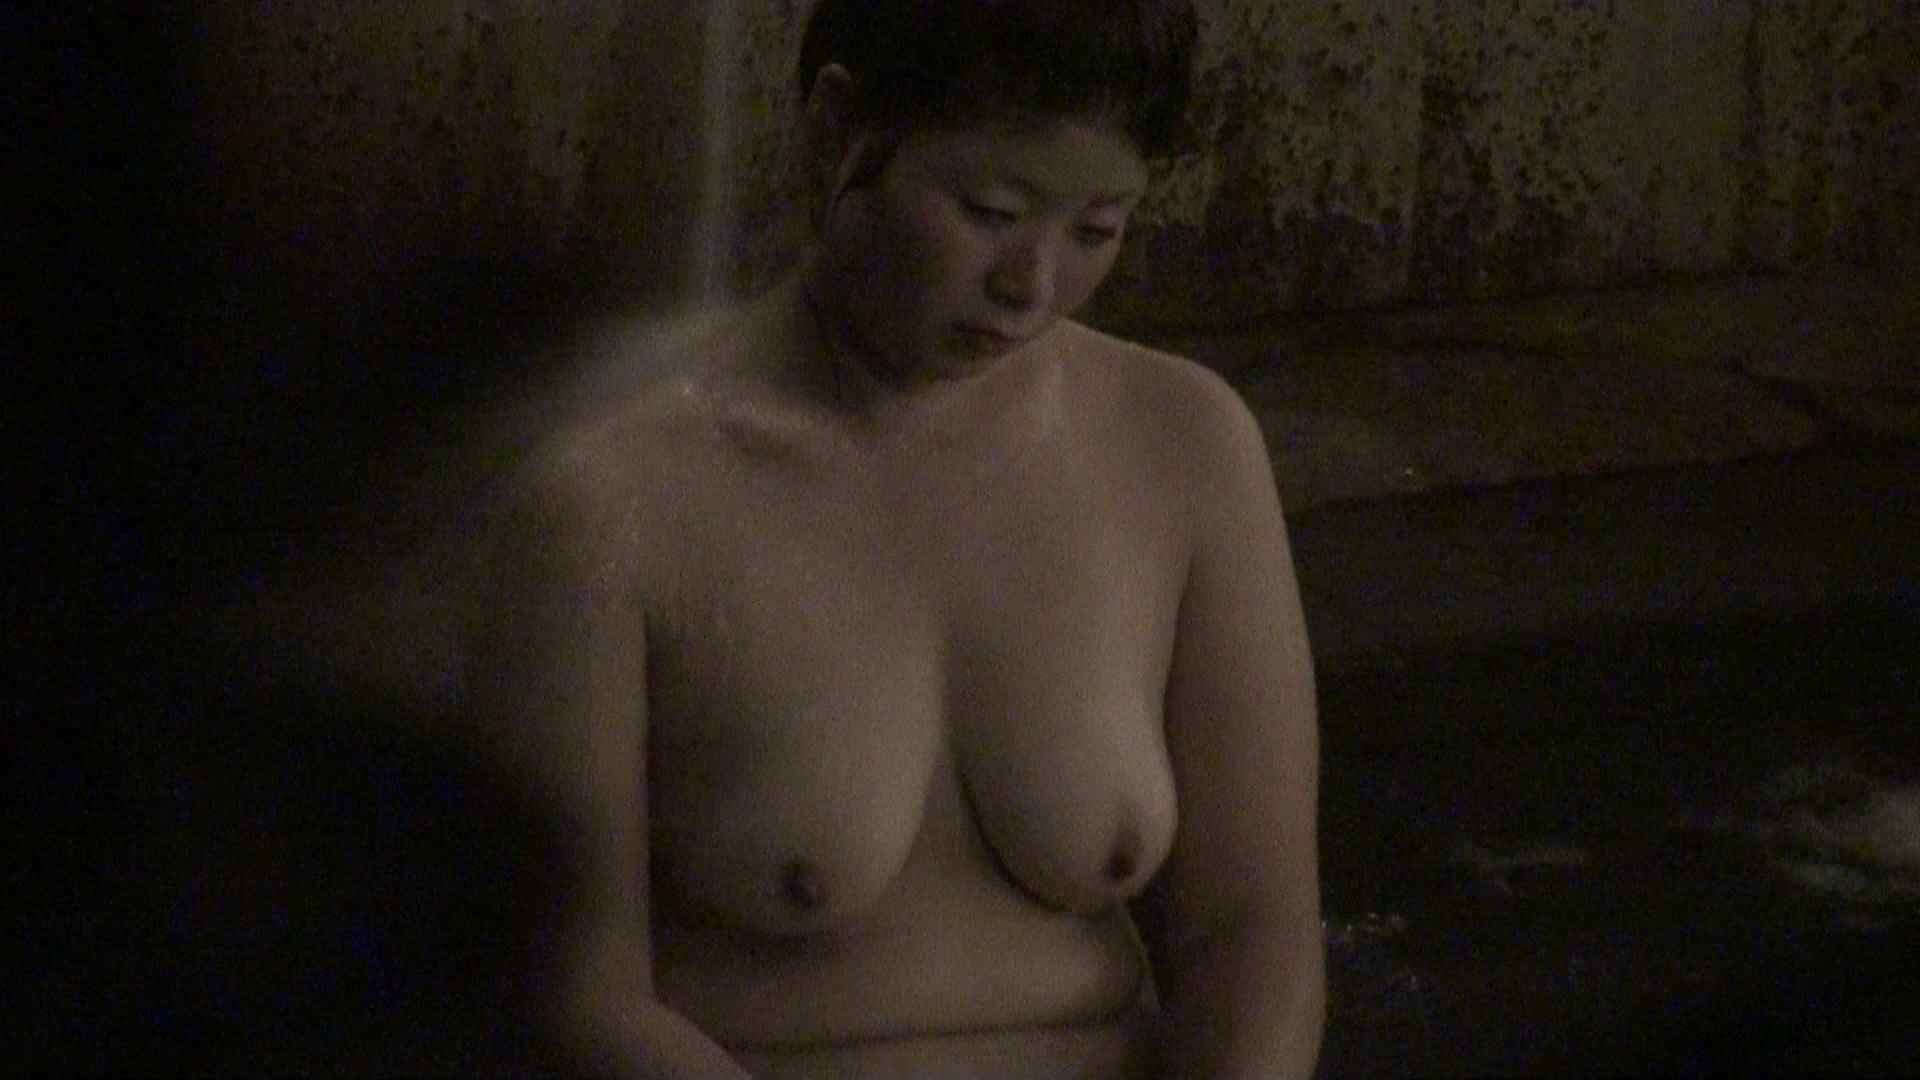 Aquaな露天風呂Vol.377 0 | 0  33連発 21